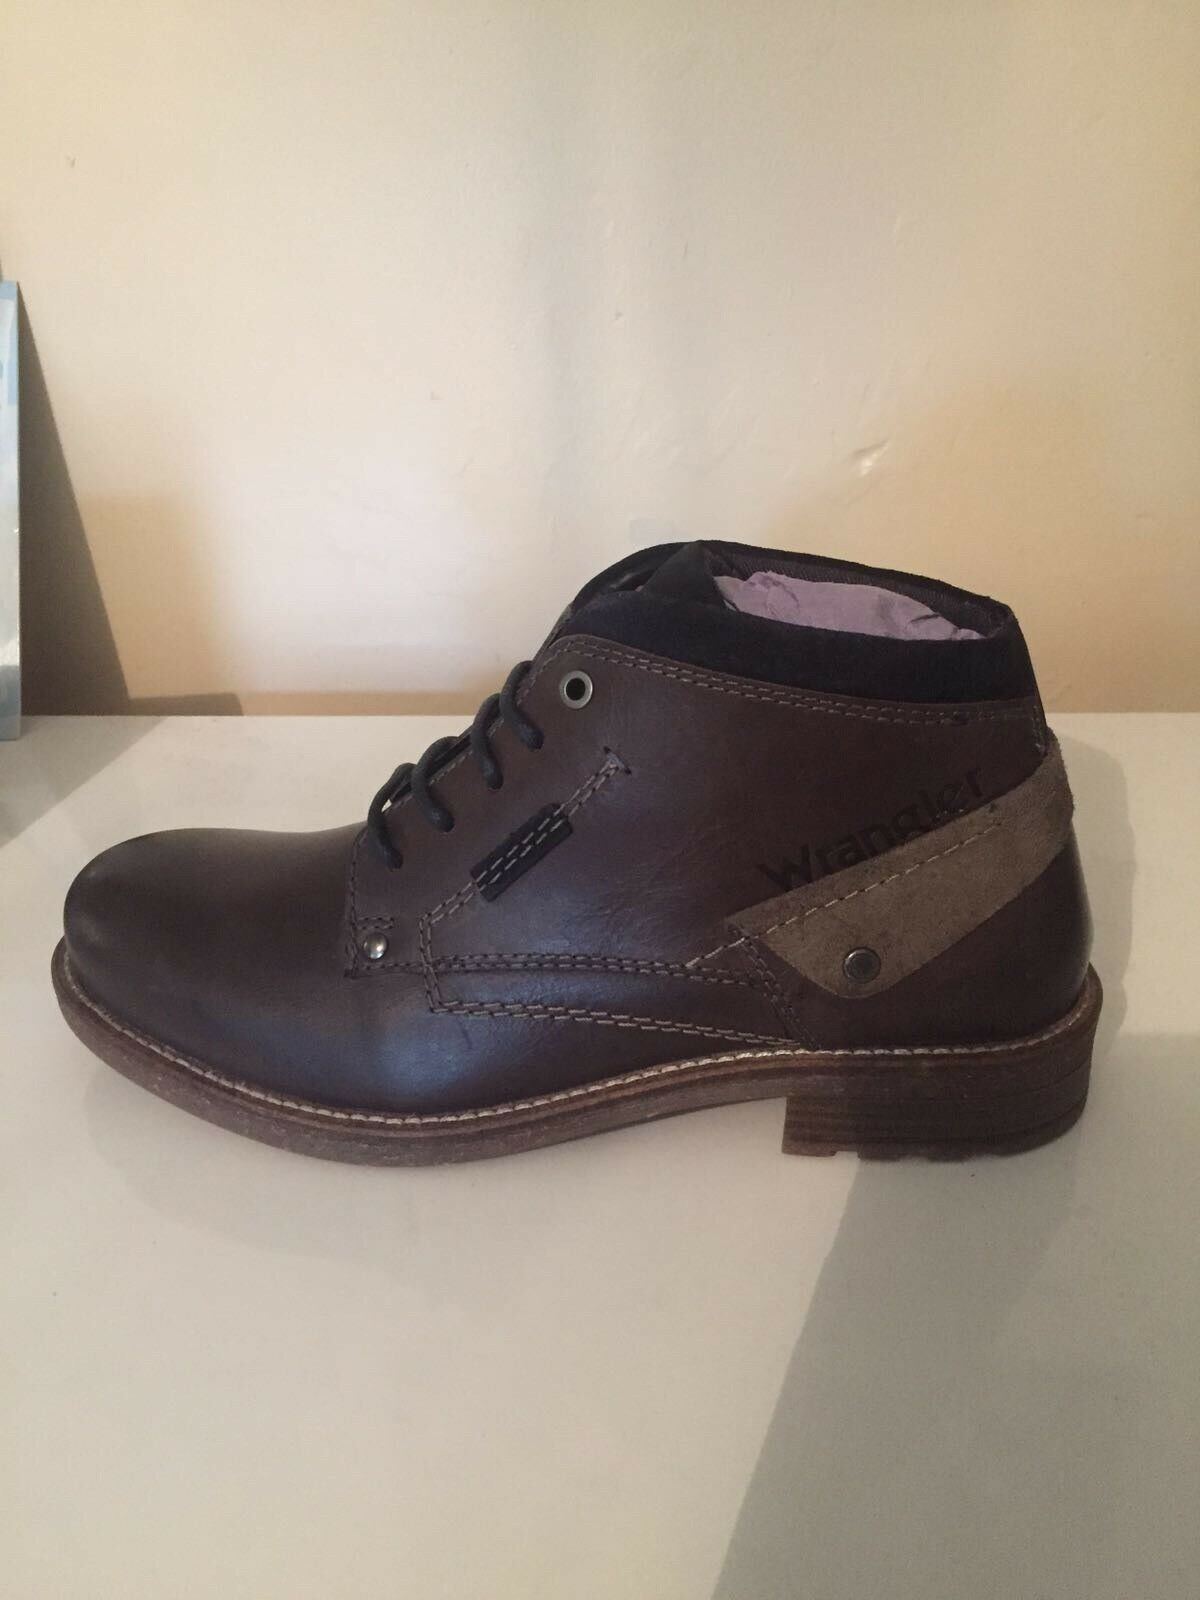 Wrangler Mens Lace Up Leather Dark grau Winter Stiefel schuhe Größe UK 9